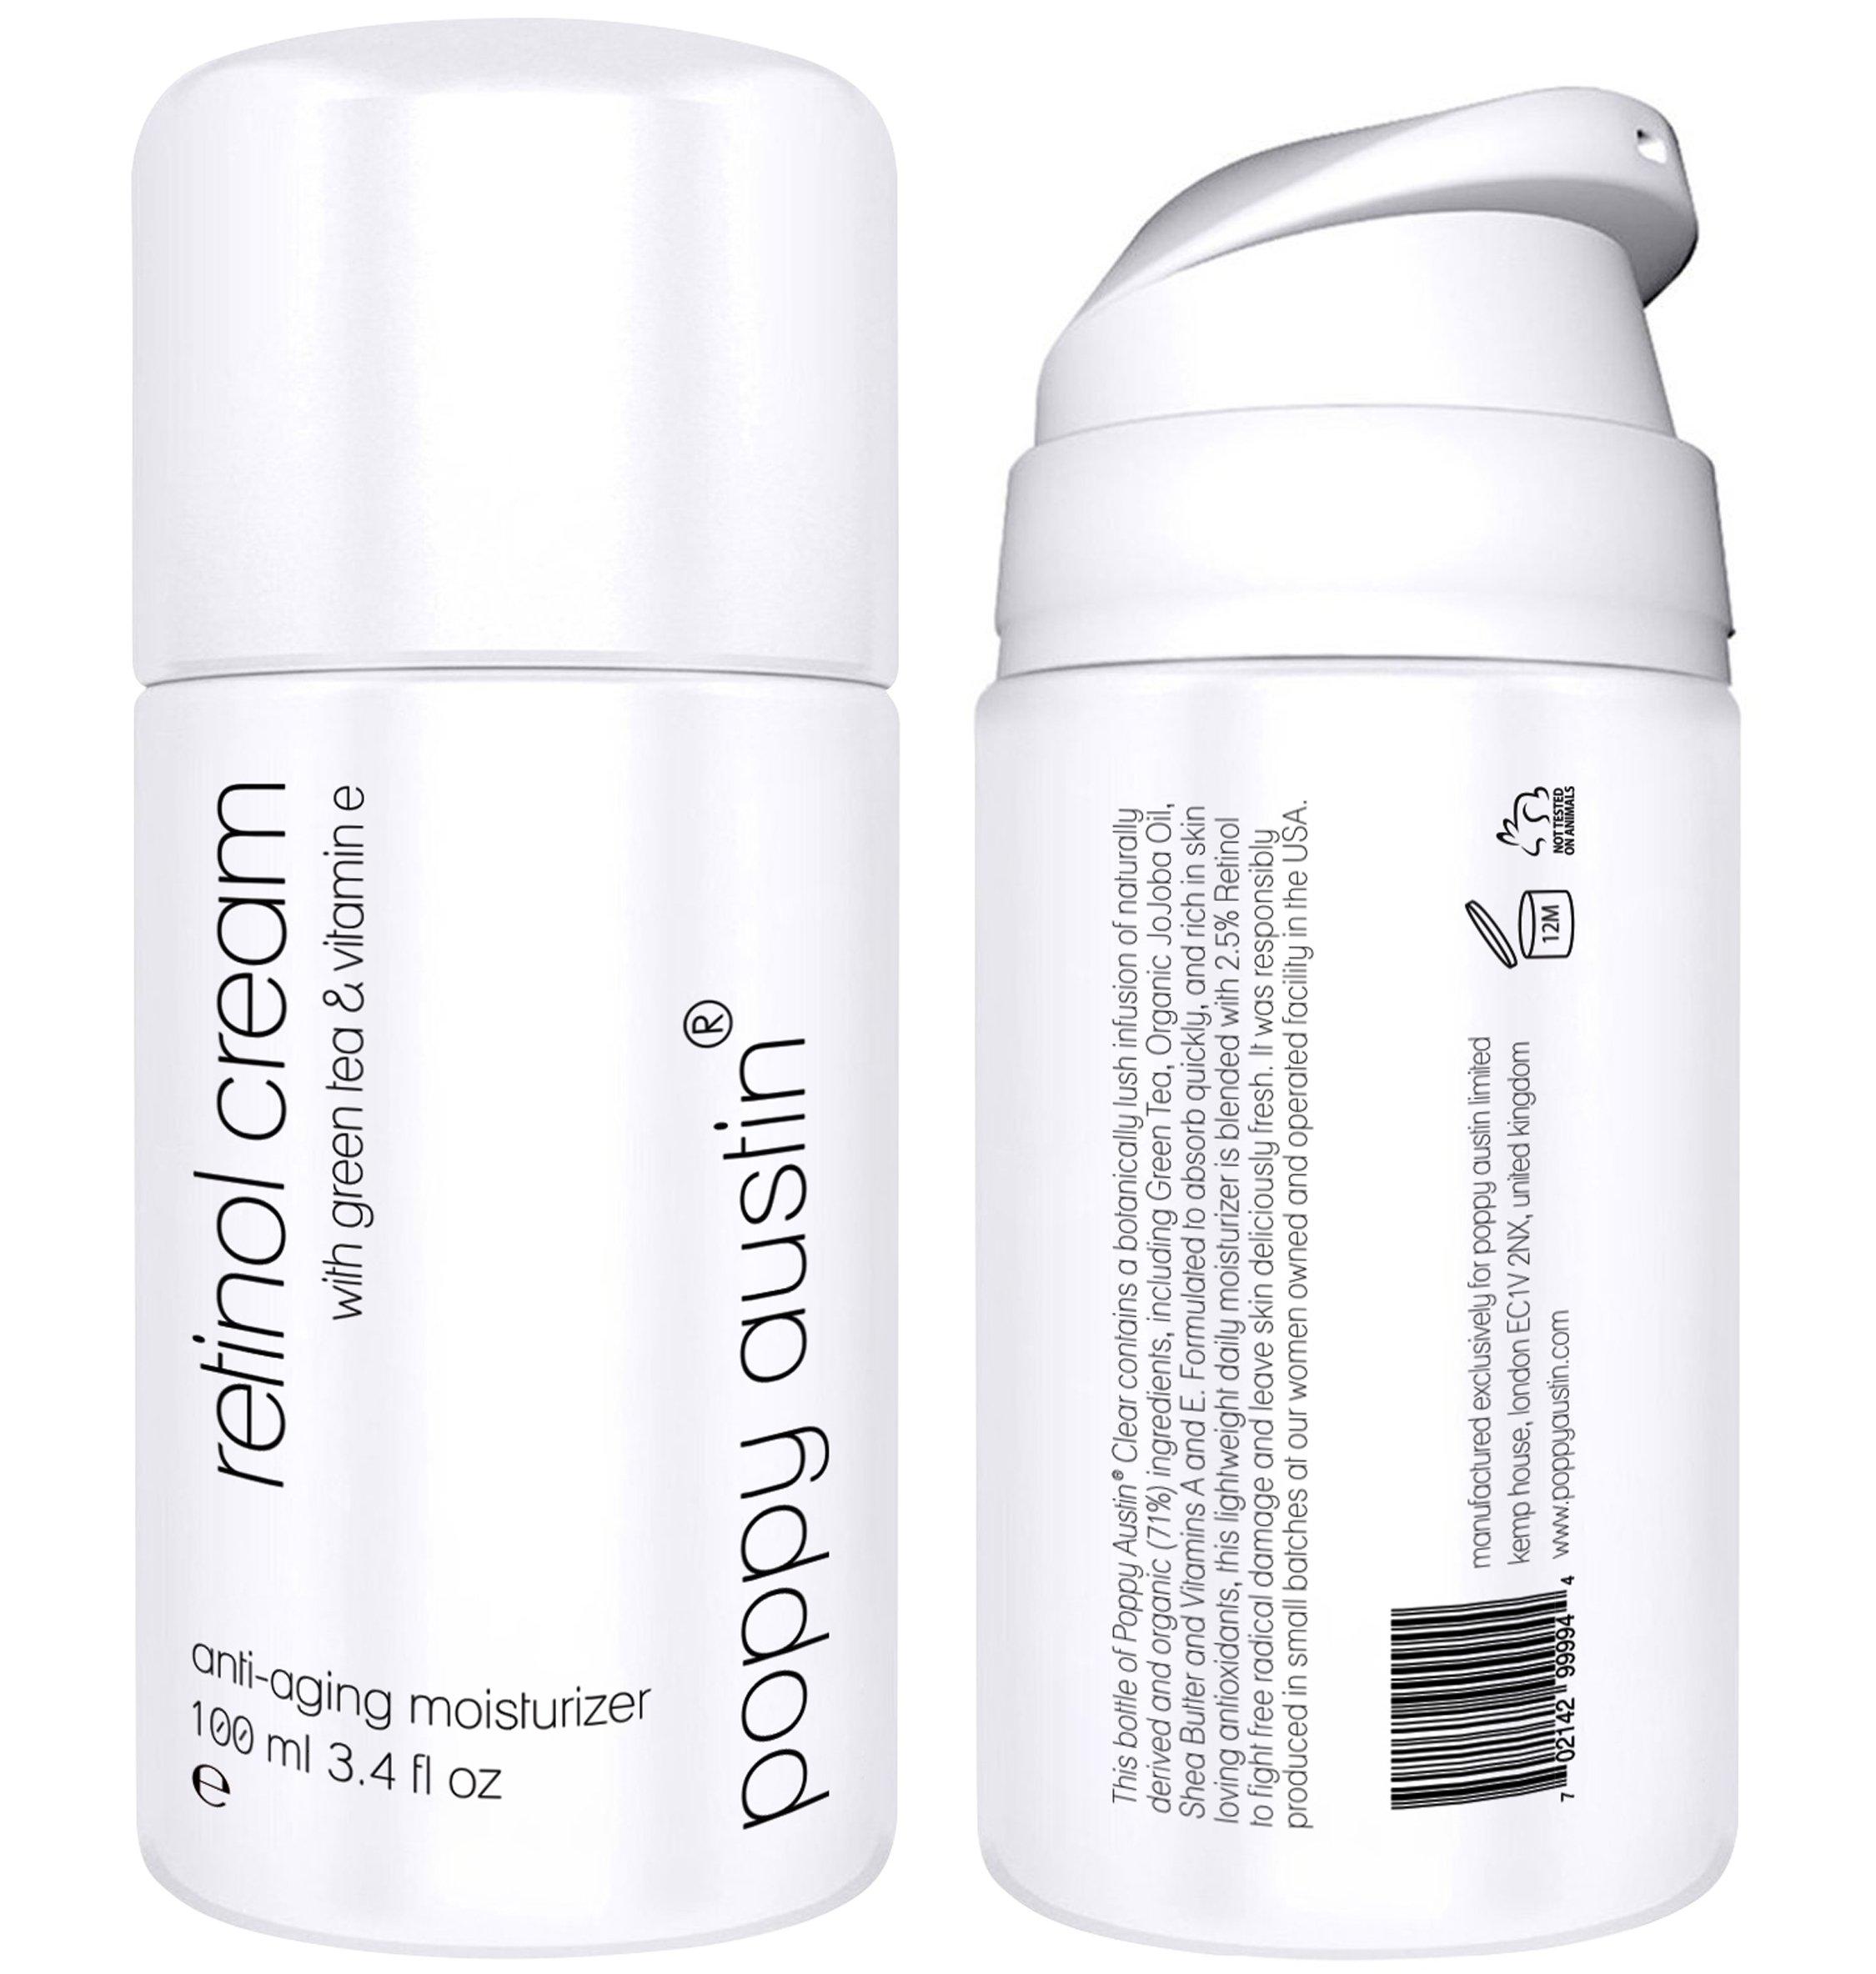 Retinol Cream for Day & Night by Poppy Austin - TRIPLED SIZED 3.4 oz - Cruelty-Free, 2.5% Retinol, Vitamin E, Green Tea & Shea Butter - Anti Ageing Face Moisturiser & 2018 Best Wrinkle Cream